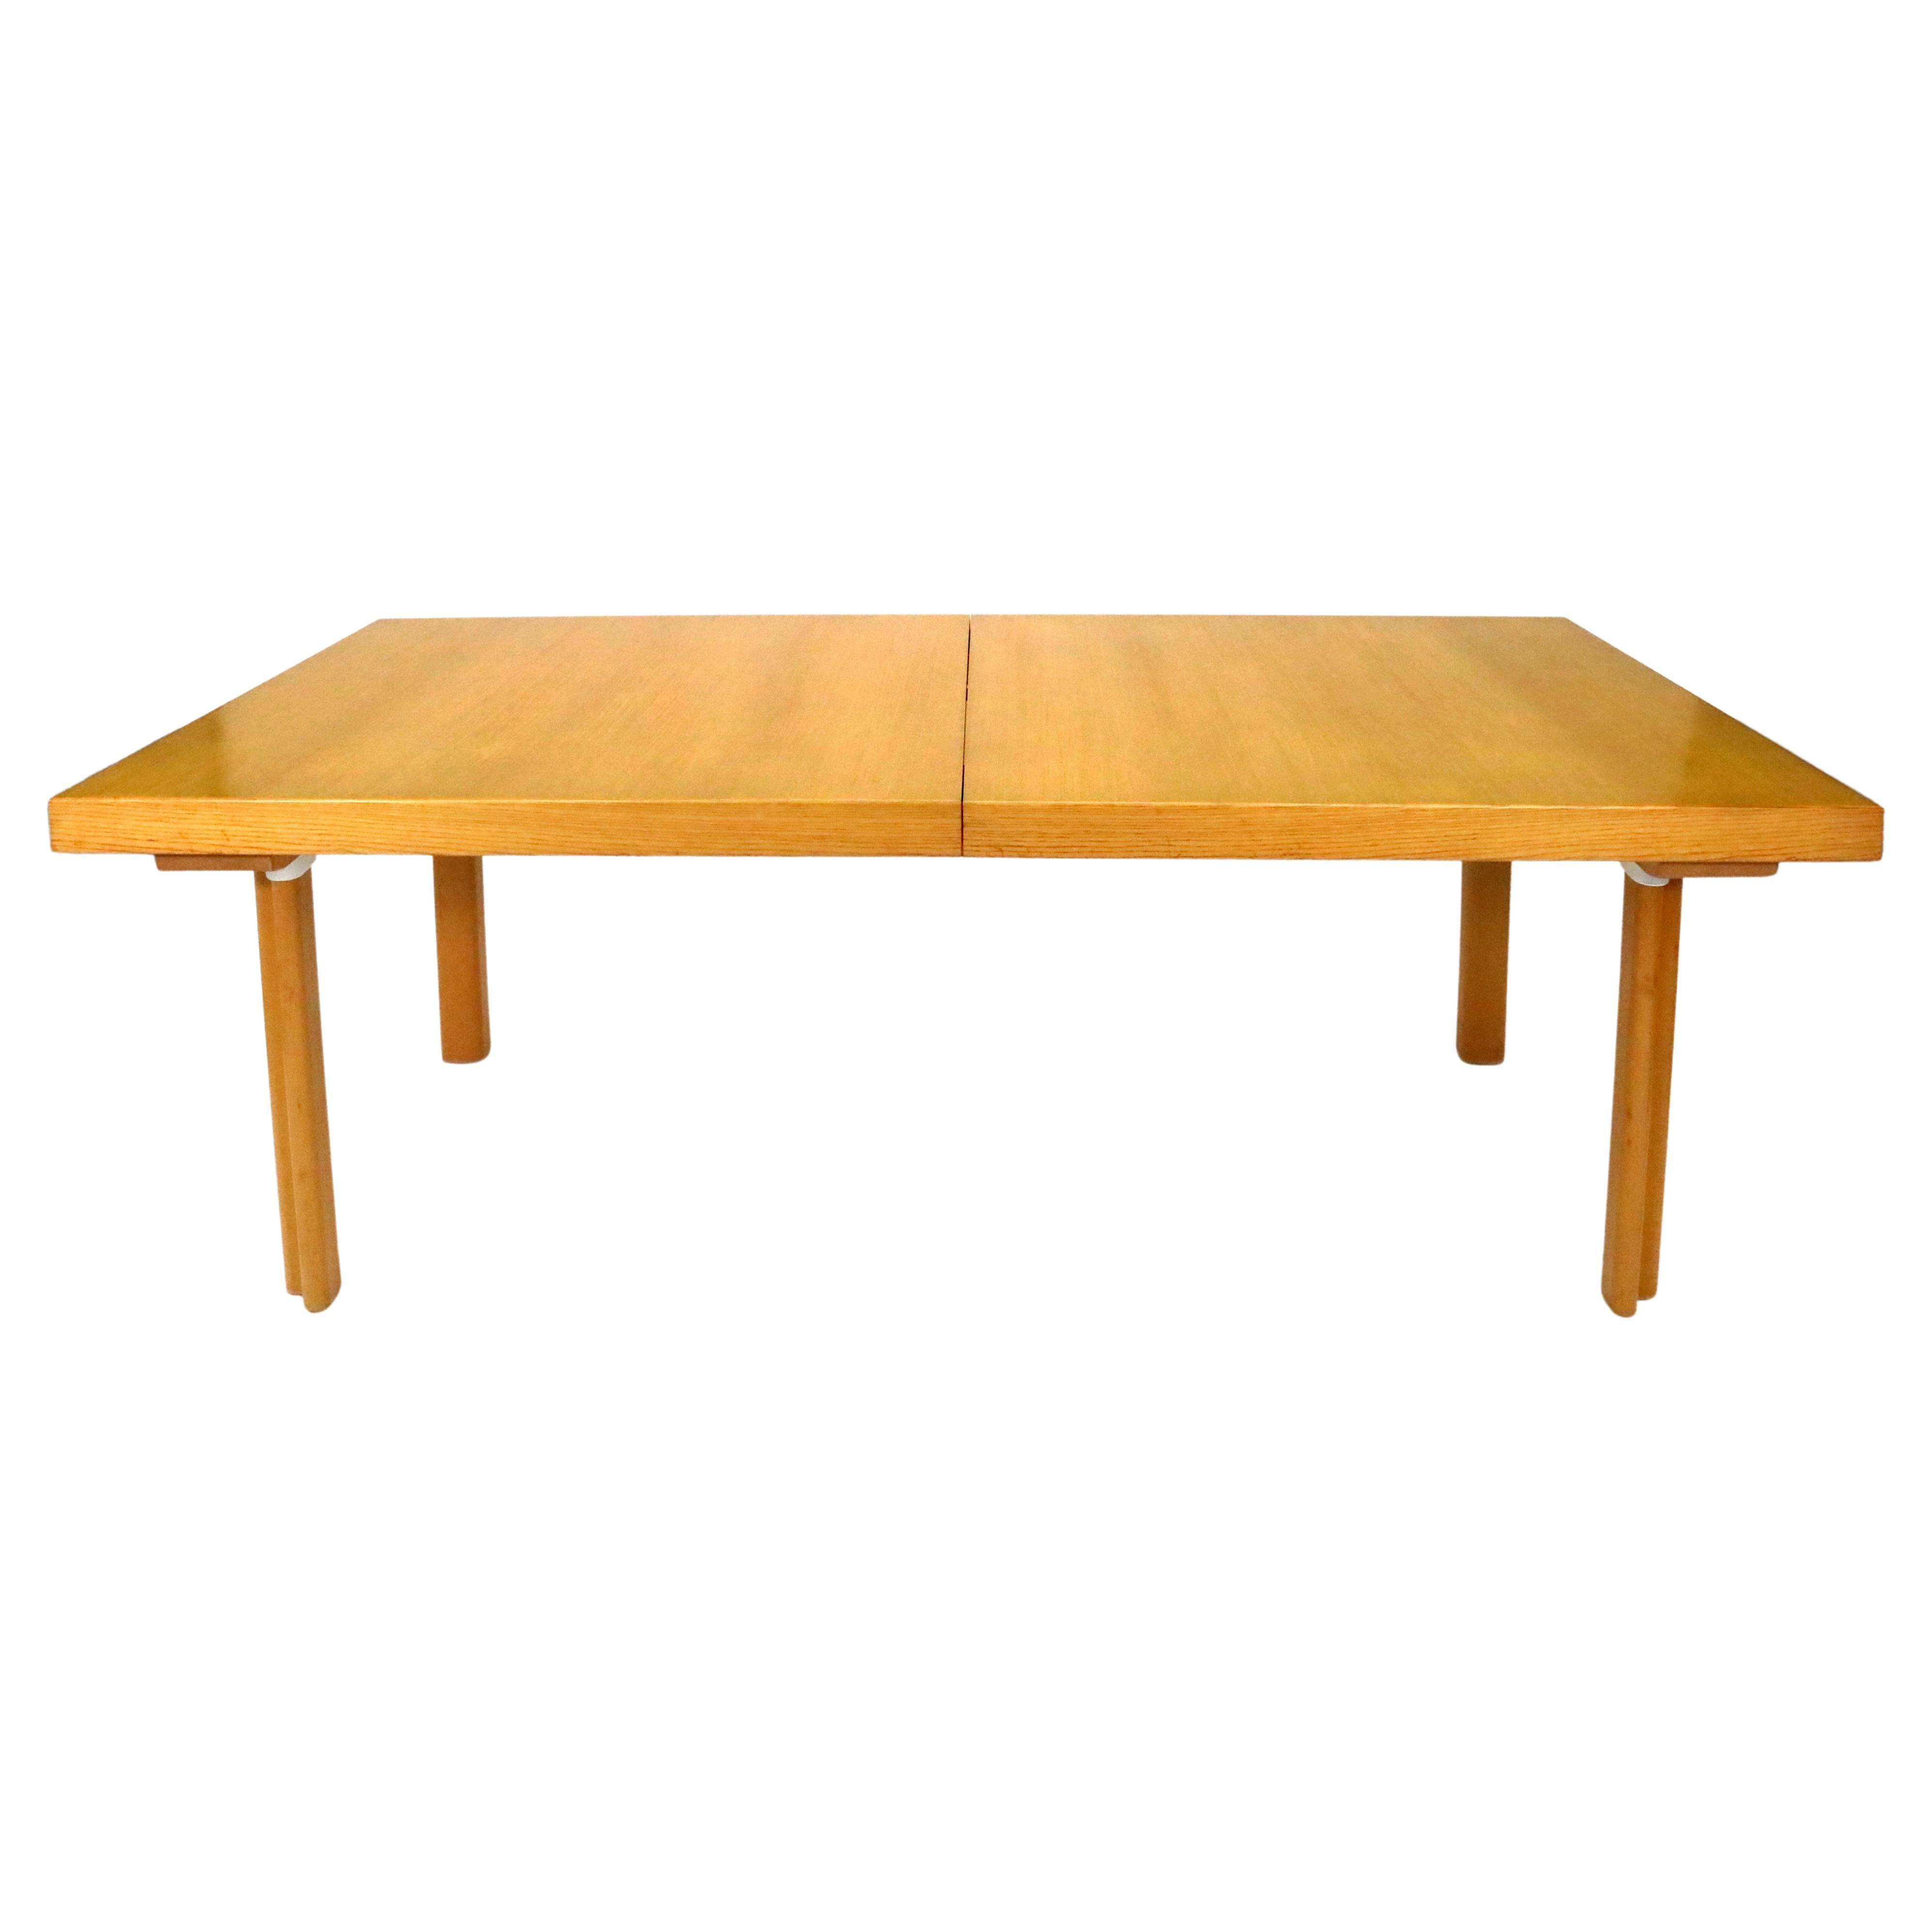 Alvar Aalto Dining Table in Birch with Two Leaves, Model H94 for Artek